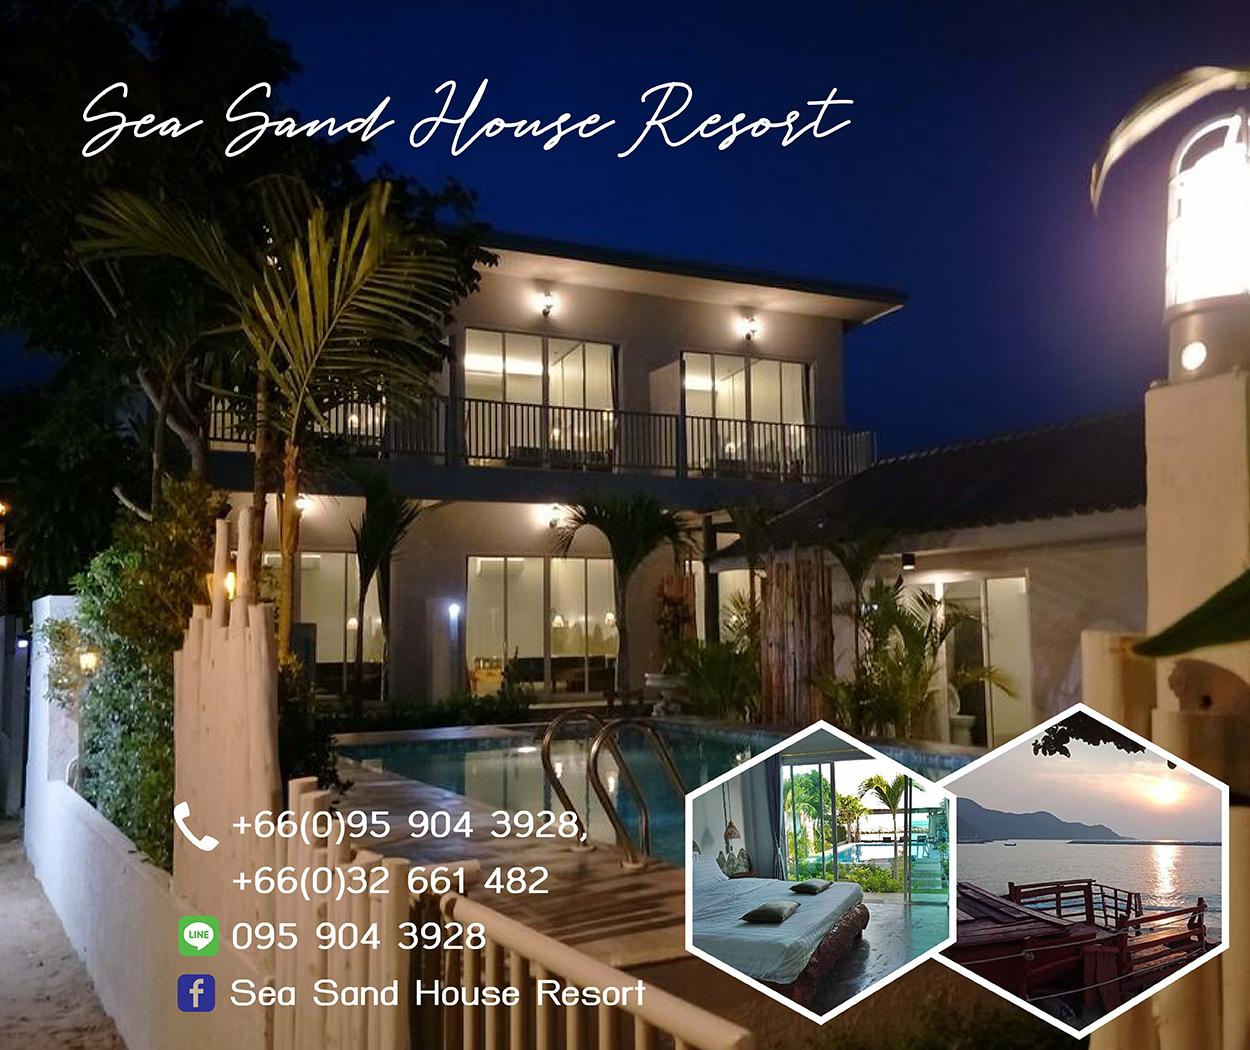 Sea Sand House Resort